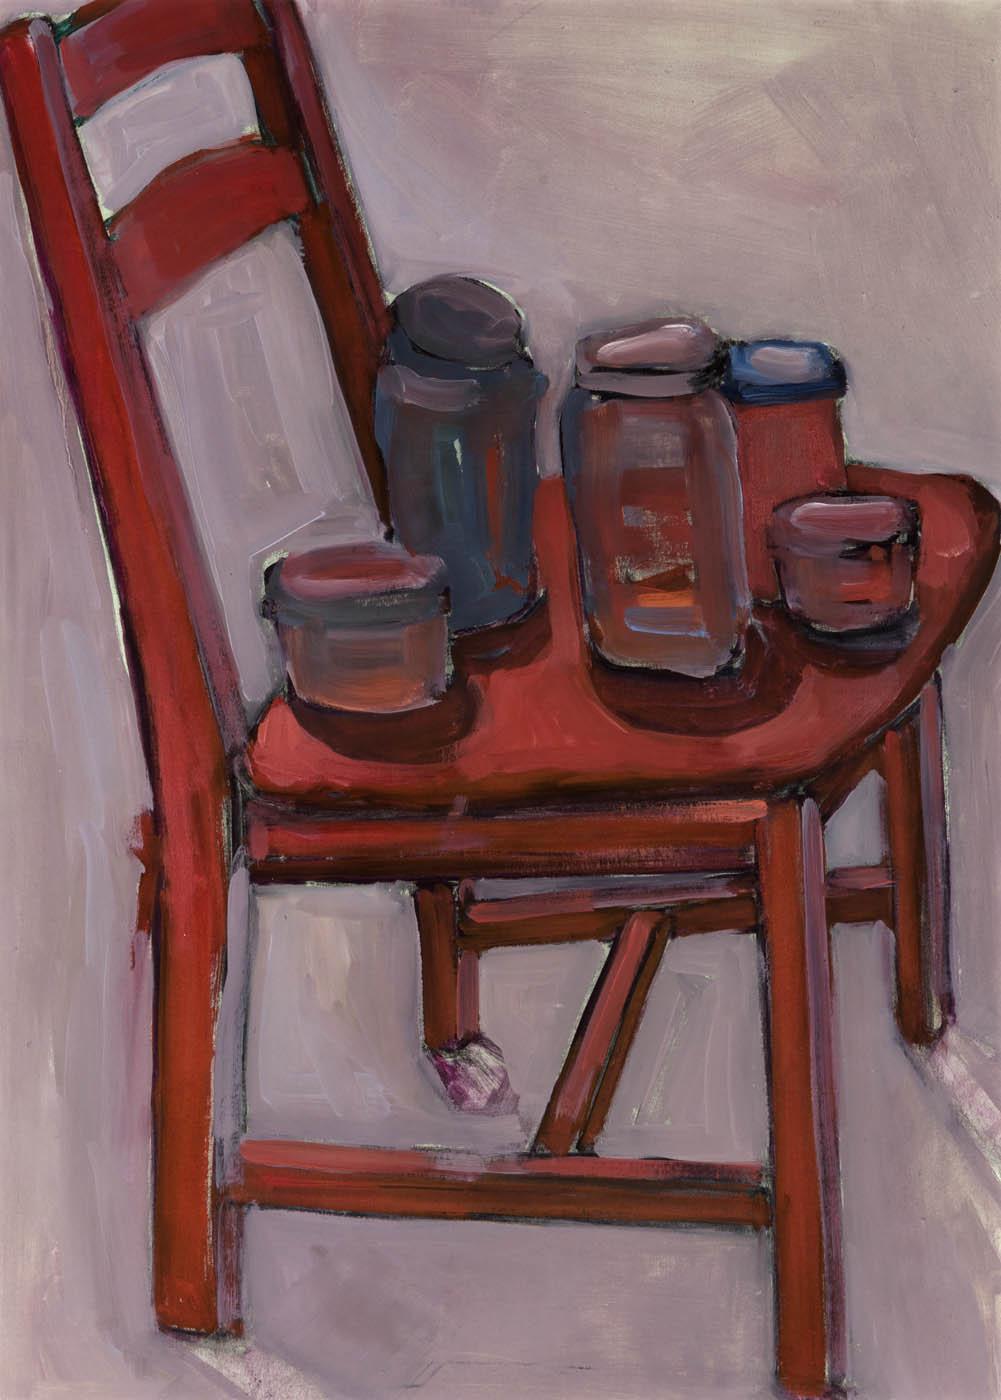 Olga Romanova - Five Jars on a Red Chair